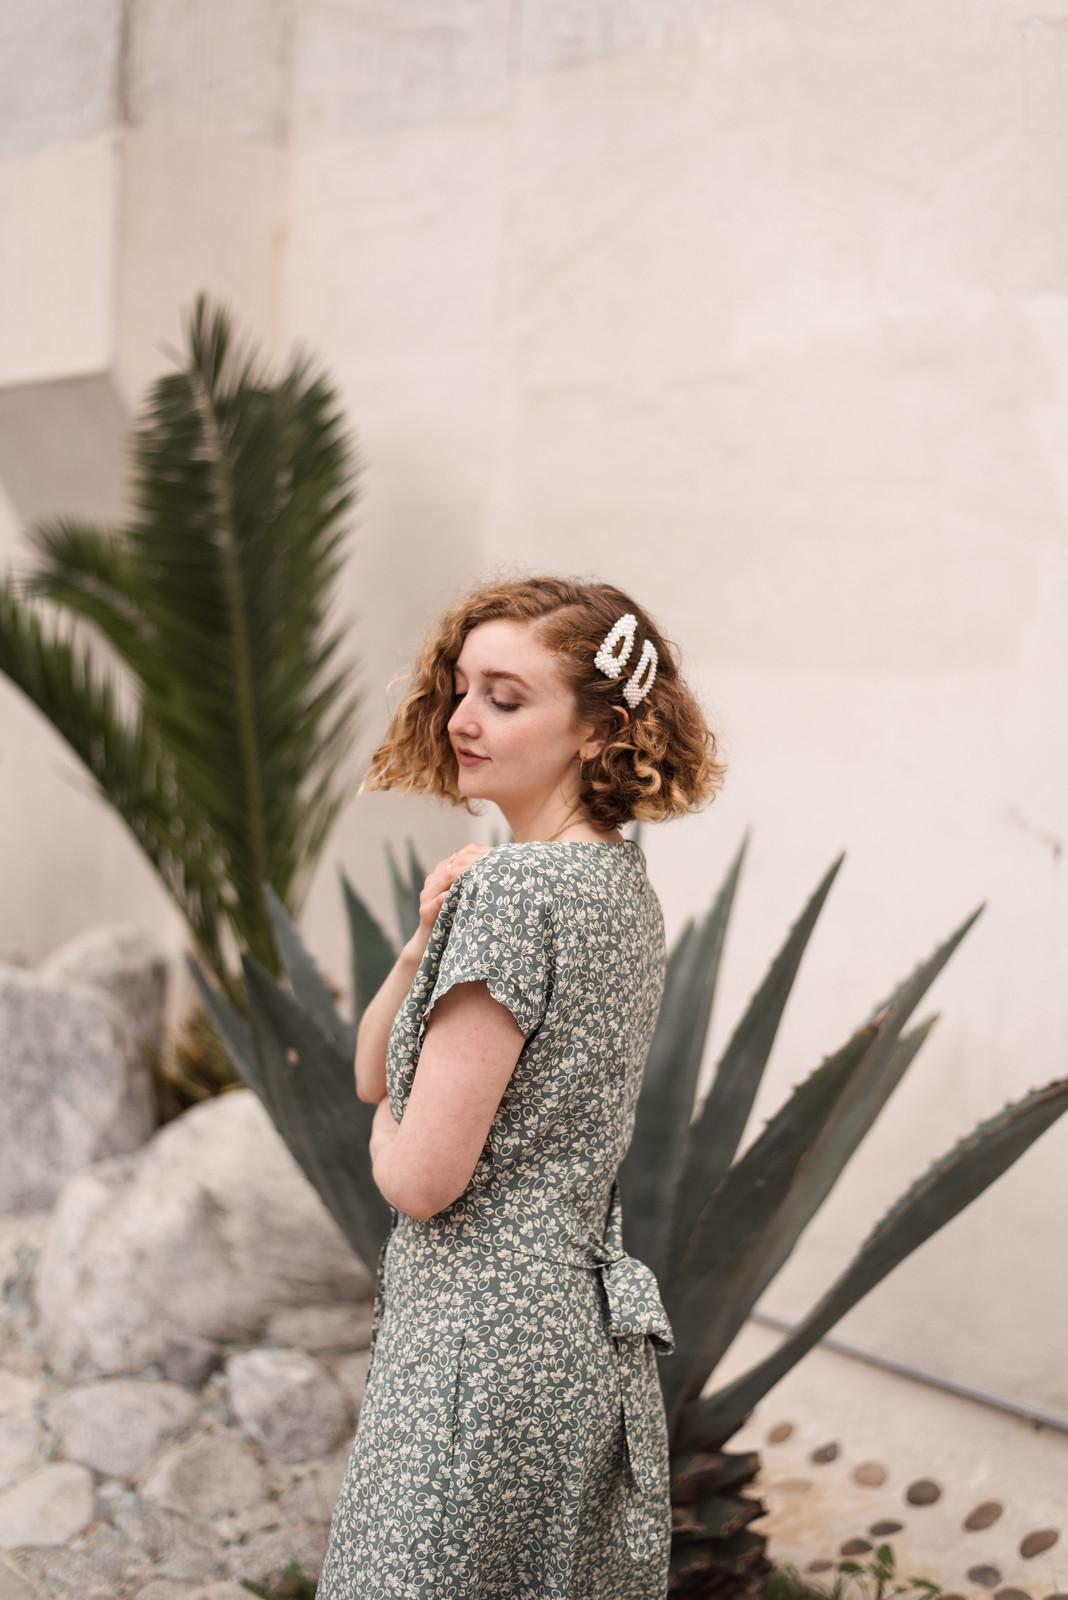 jaelle designs spring 2019 trend green on juliettelaura.com